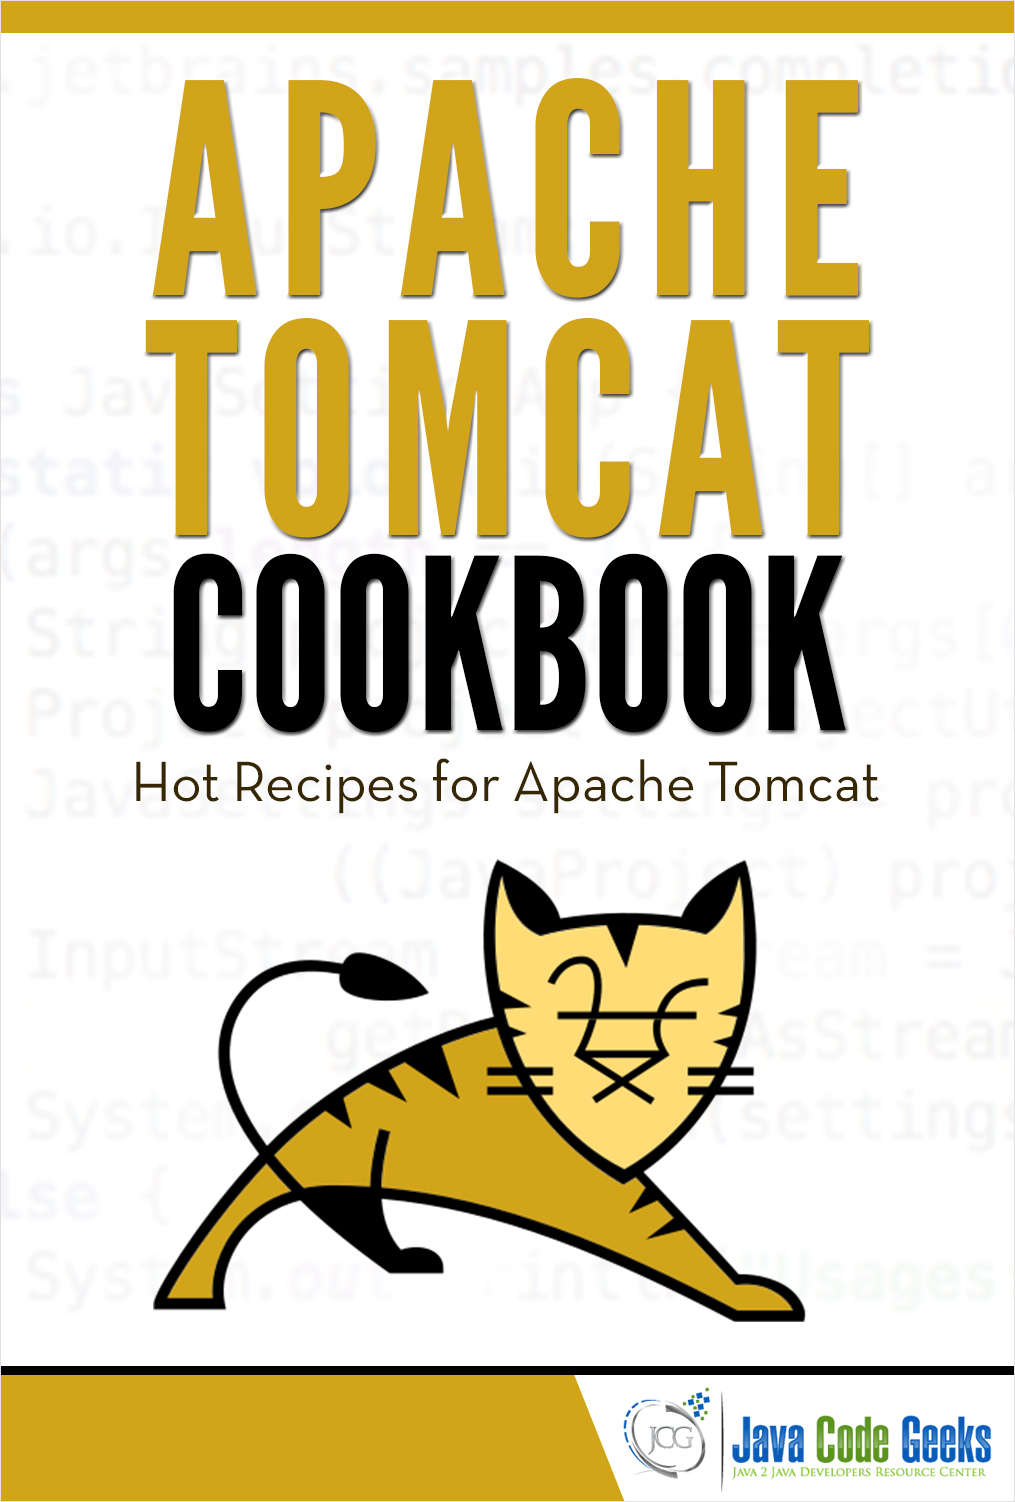 Apache Tomcat Cookbook